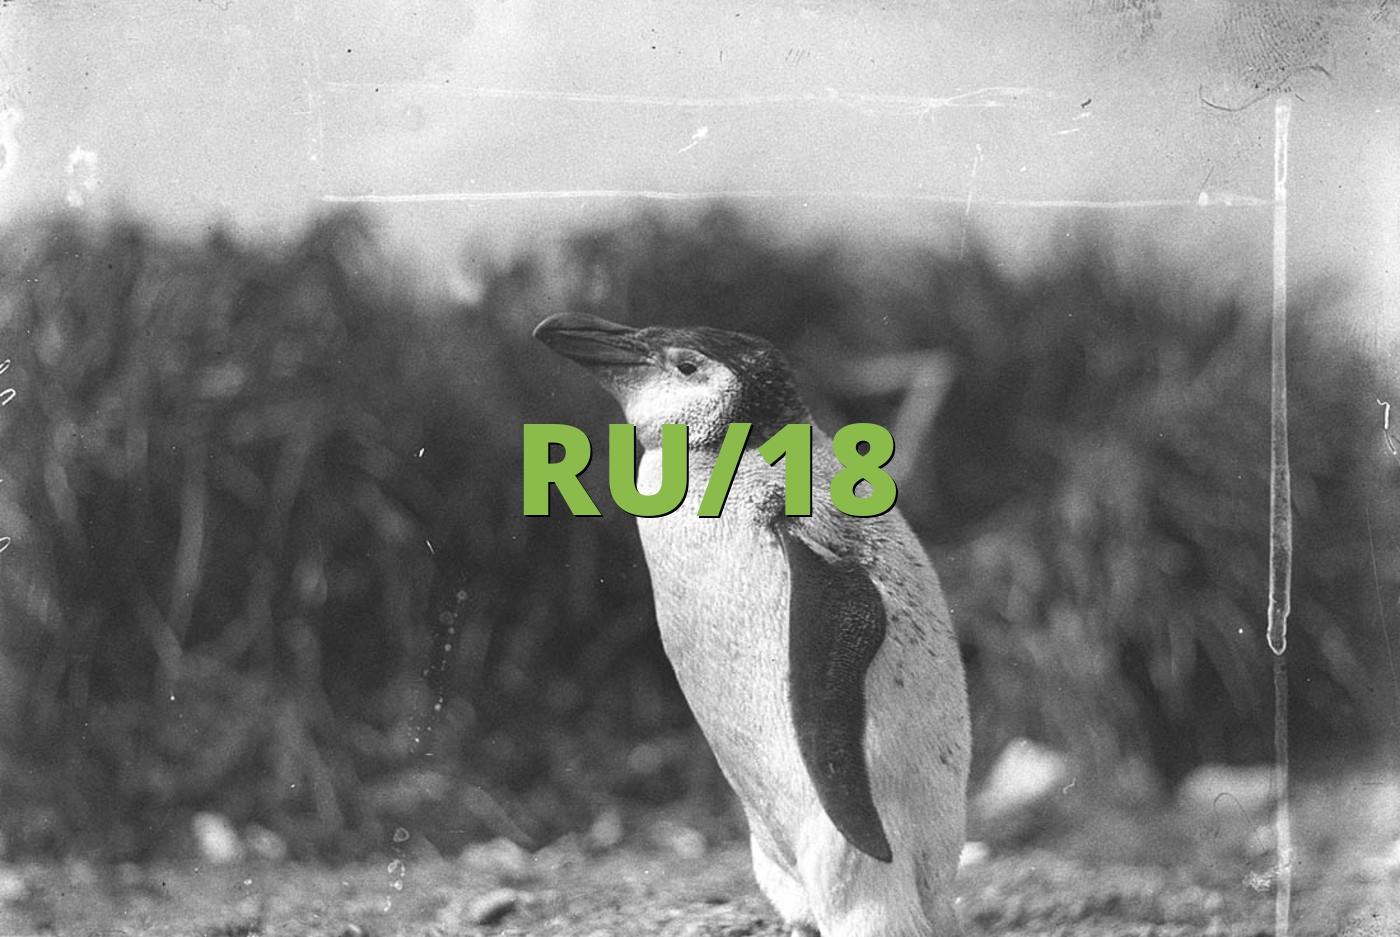 RU/18